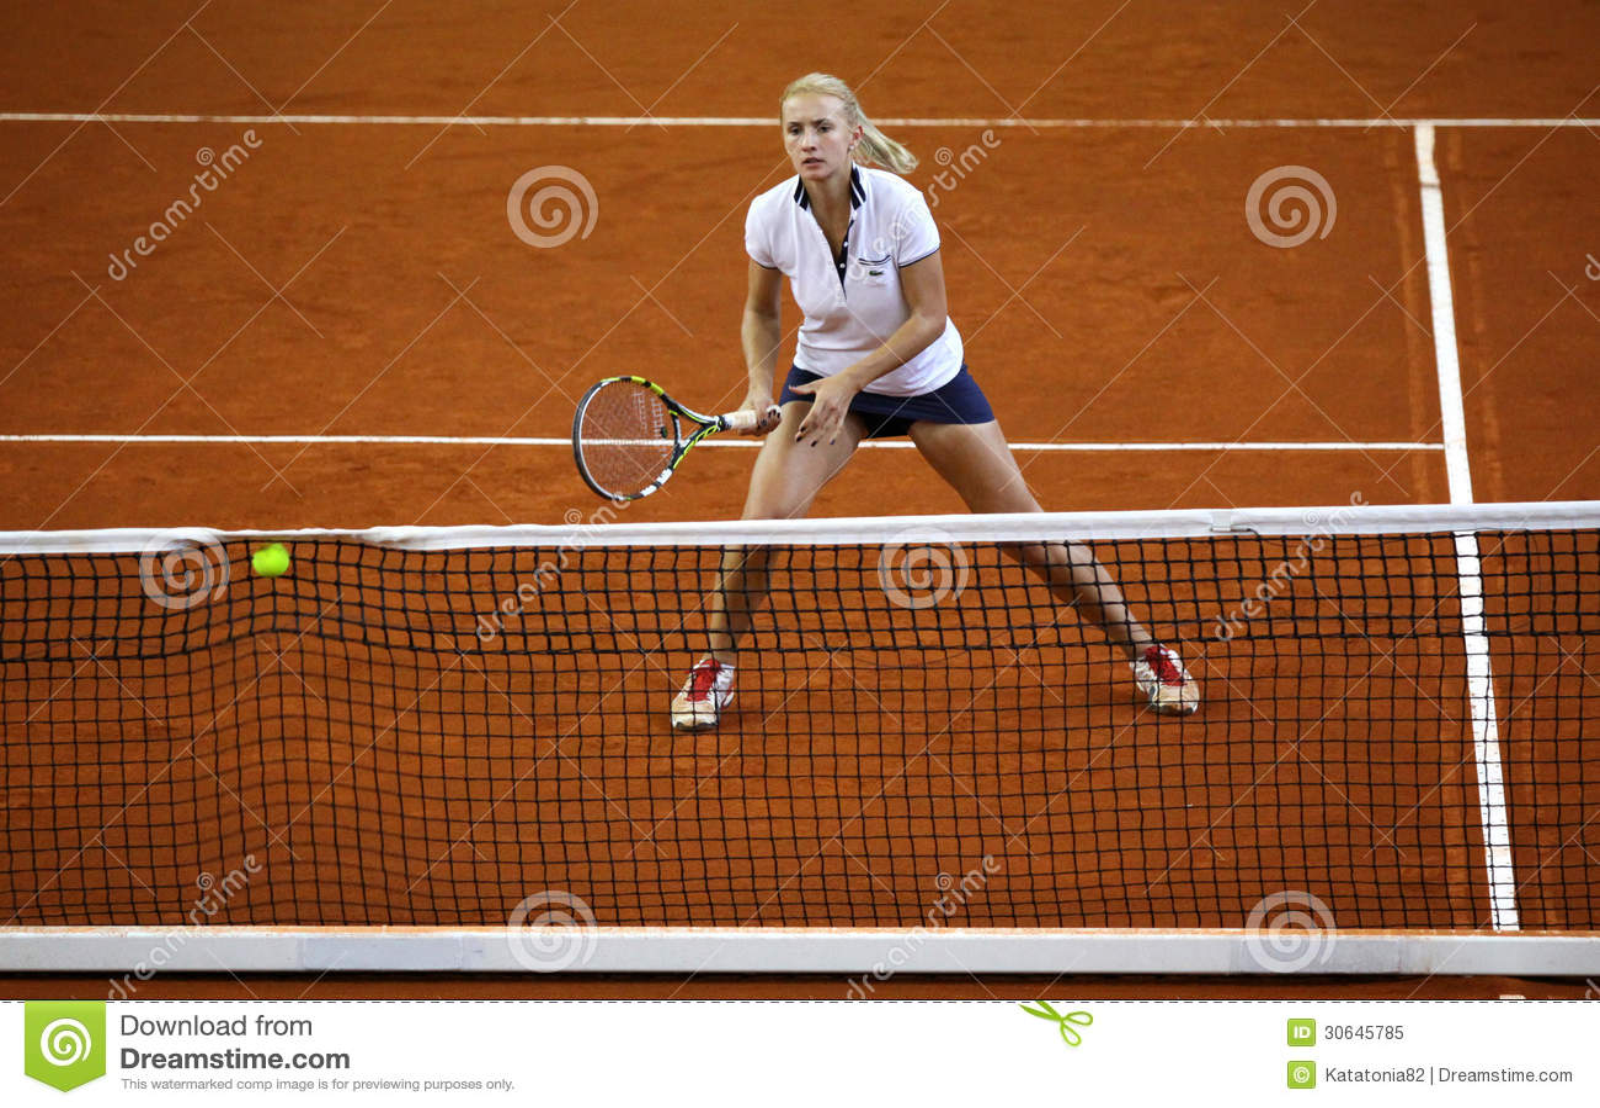 fedcup tennis game ukraine vs canada editorial image image 30645785. Black Bedroom Furniture Sets. Home Design Ideas